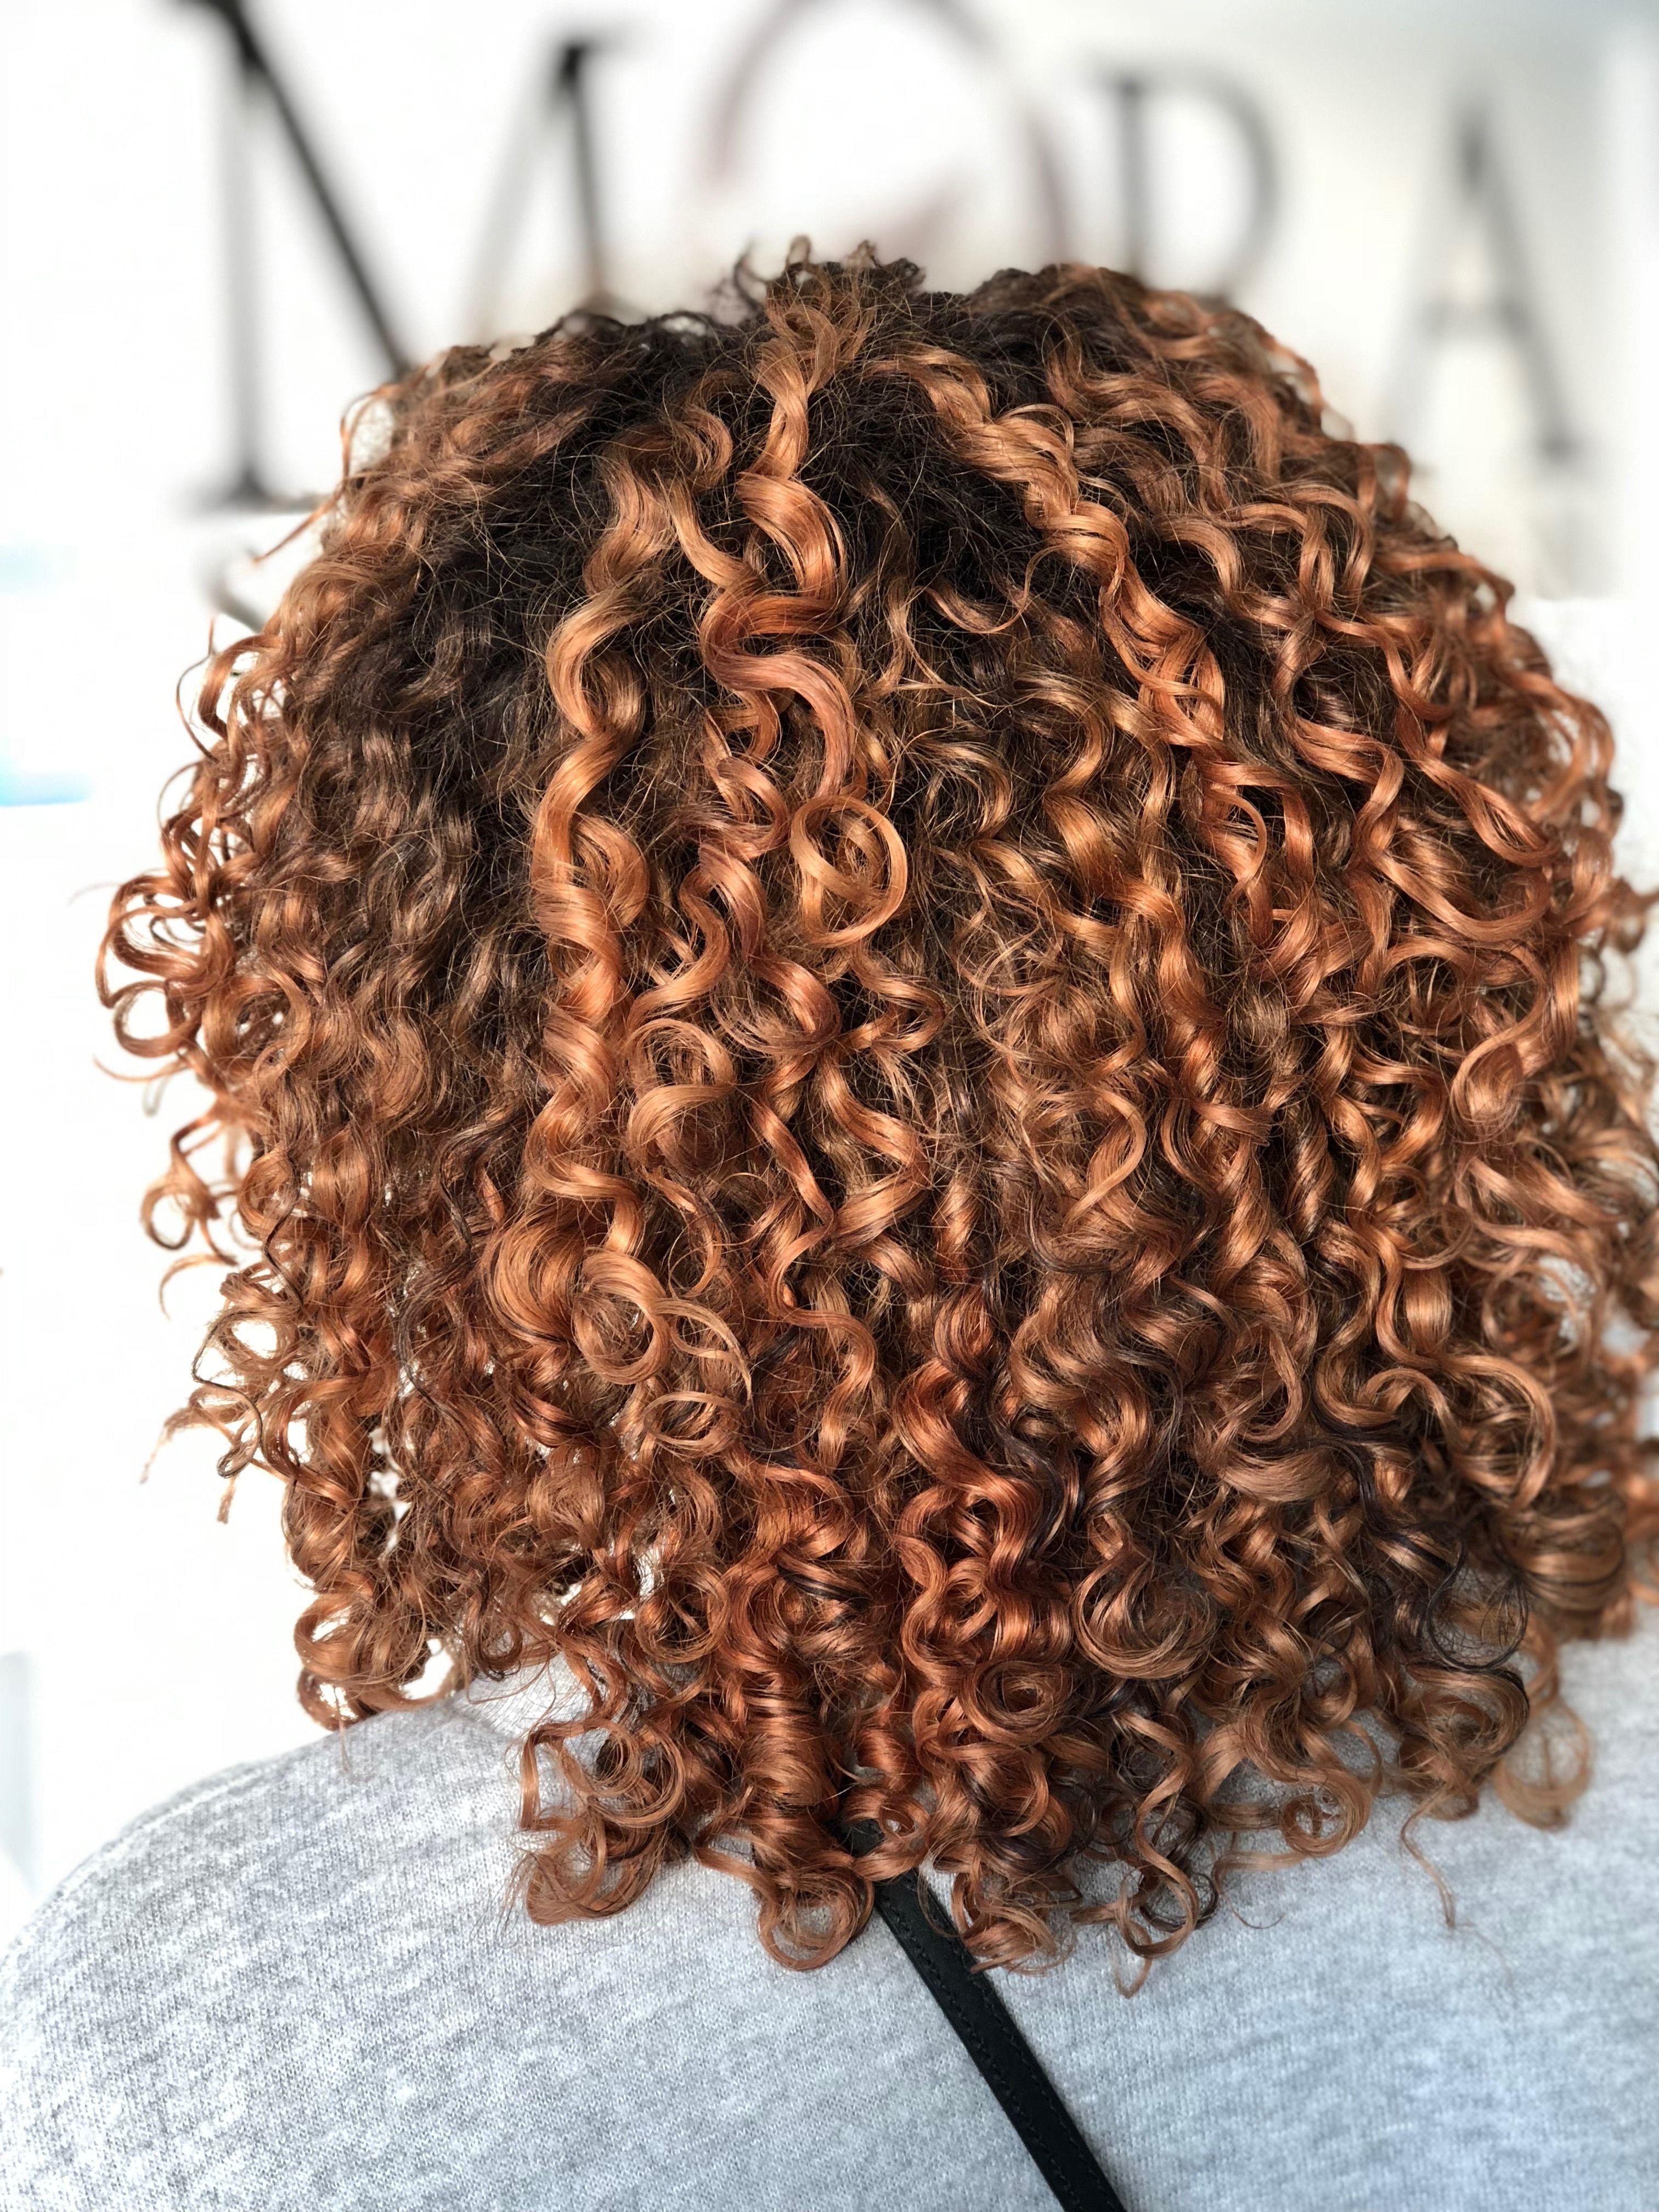 Best Hair Color Salon South Plainfield Nj Top 10 Hair Salons New Jersey Hair Salon Price List Cool Hairstyles Hair Color